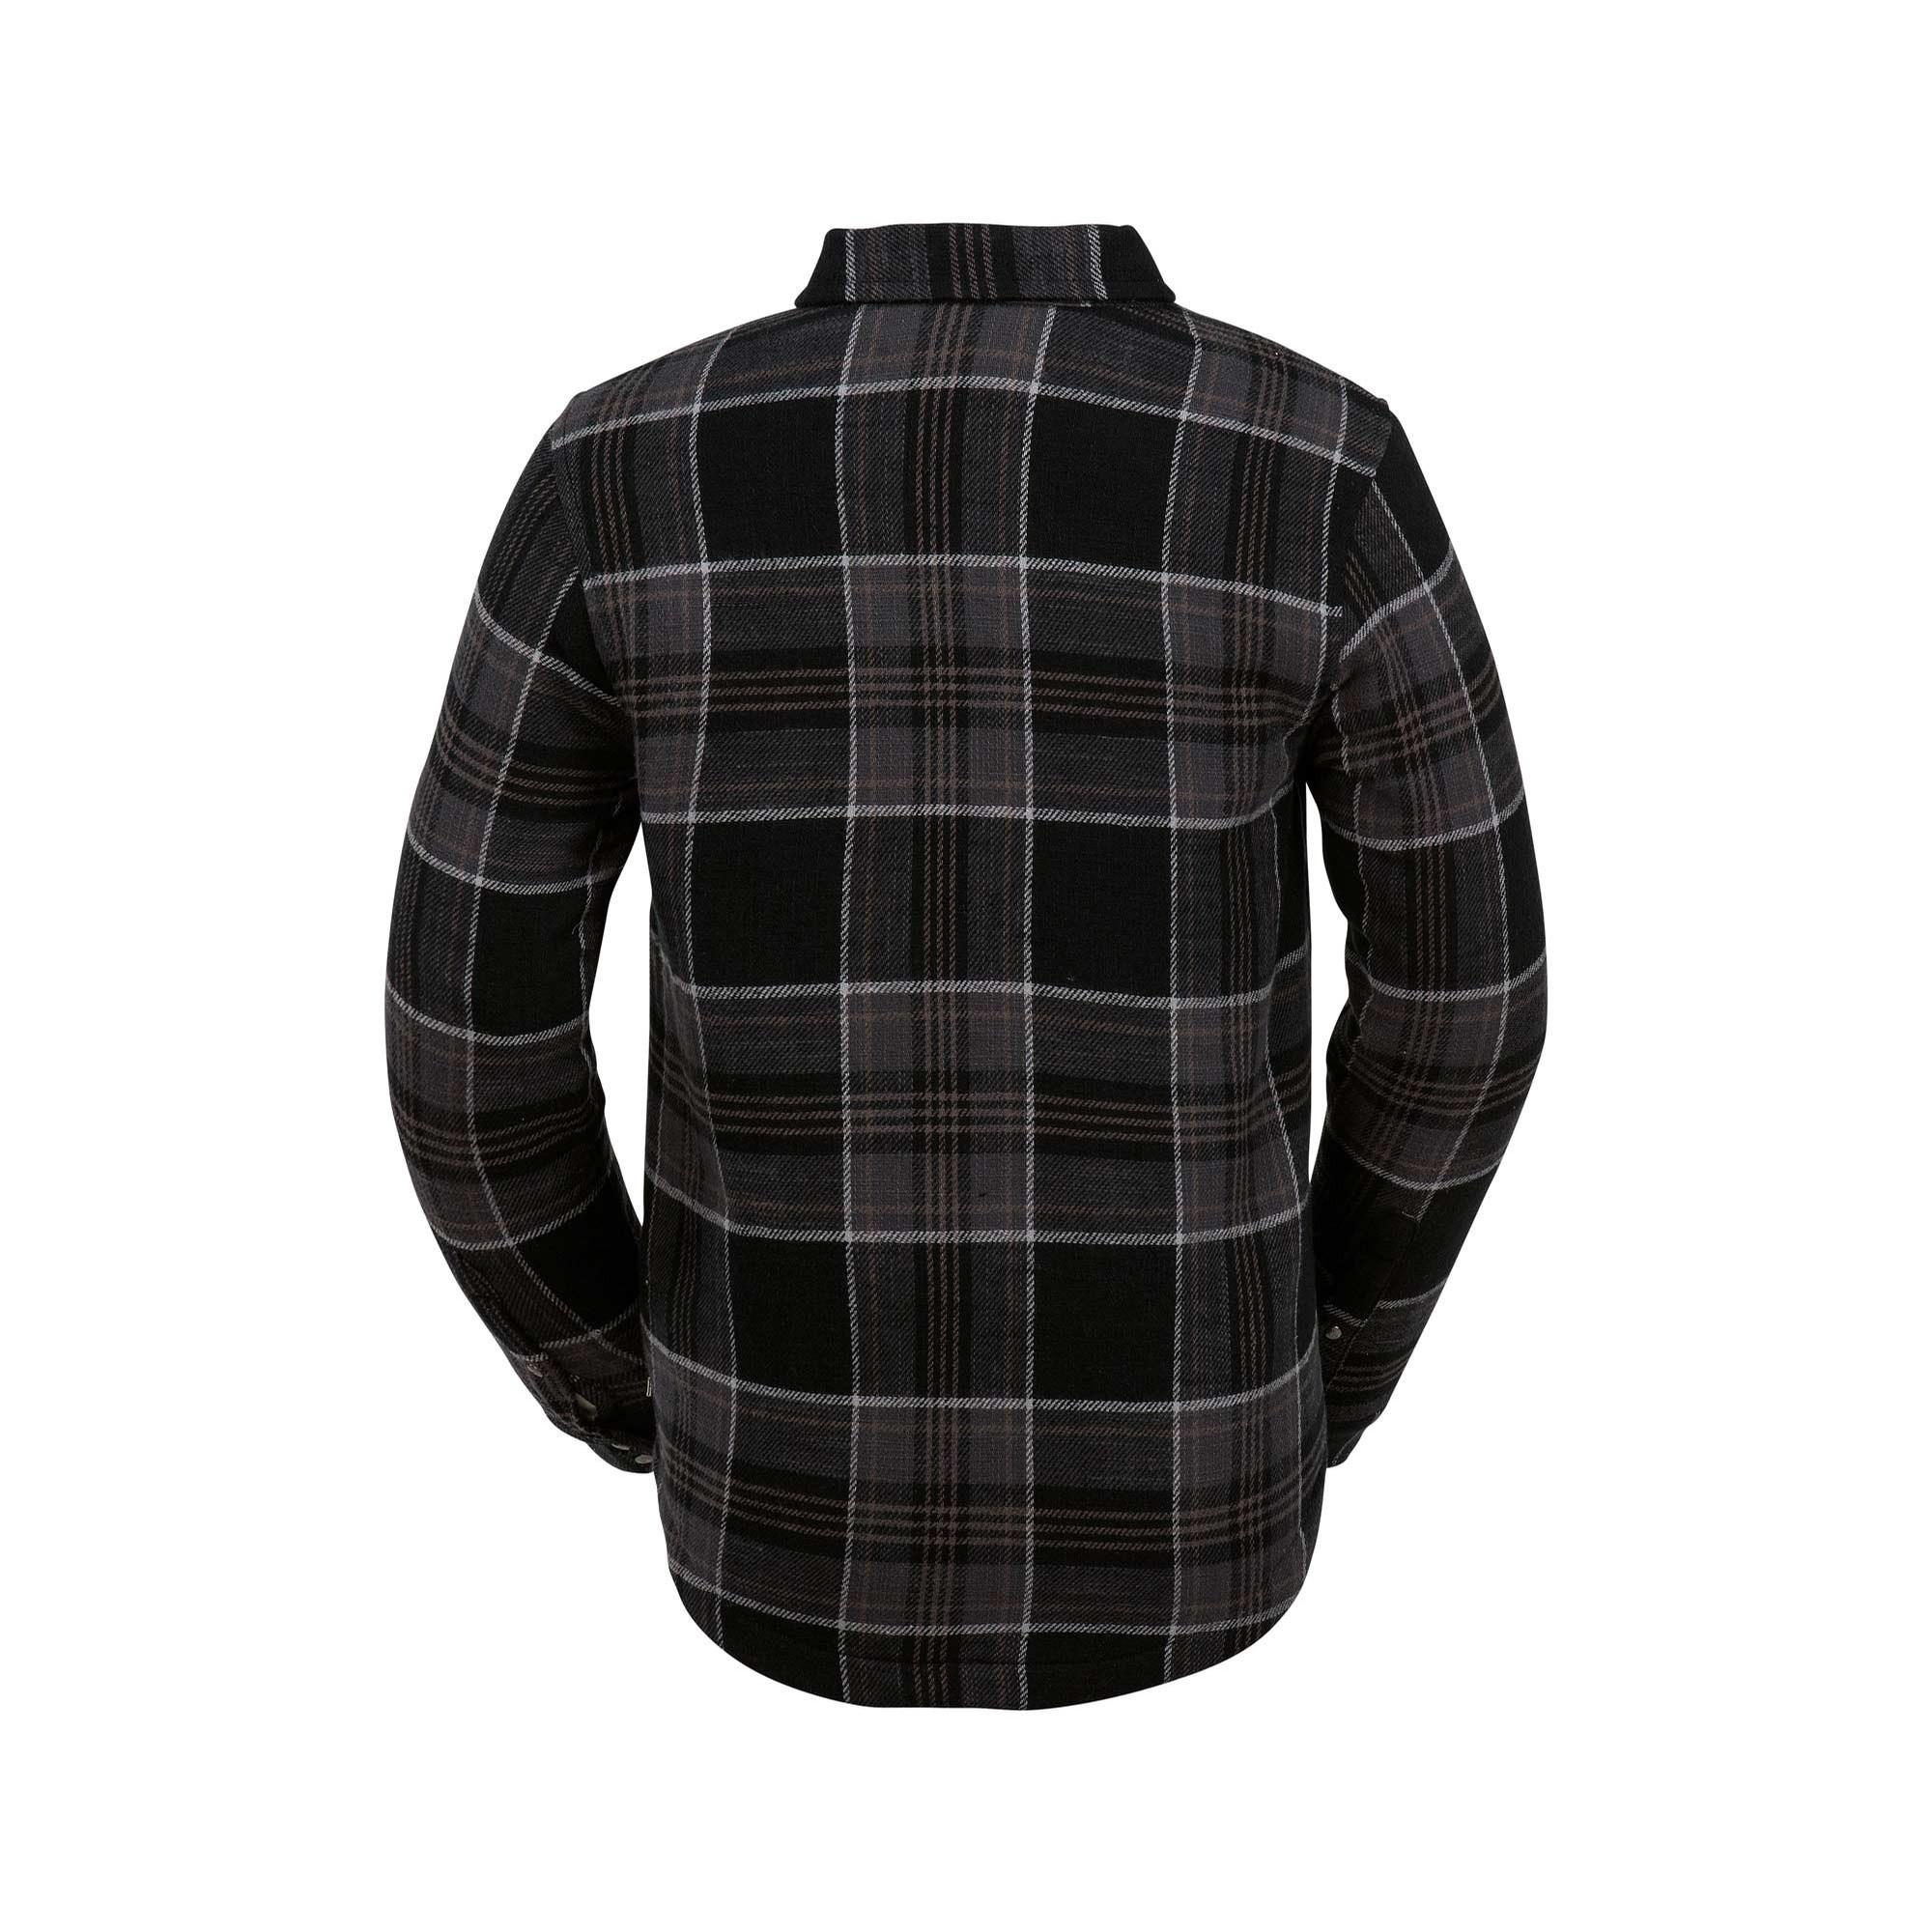 Kids Bison Insulated Flannel Jacket (Black)